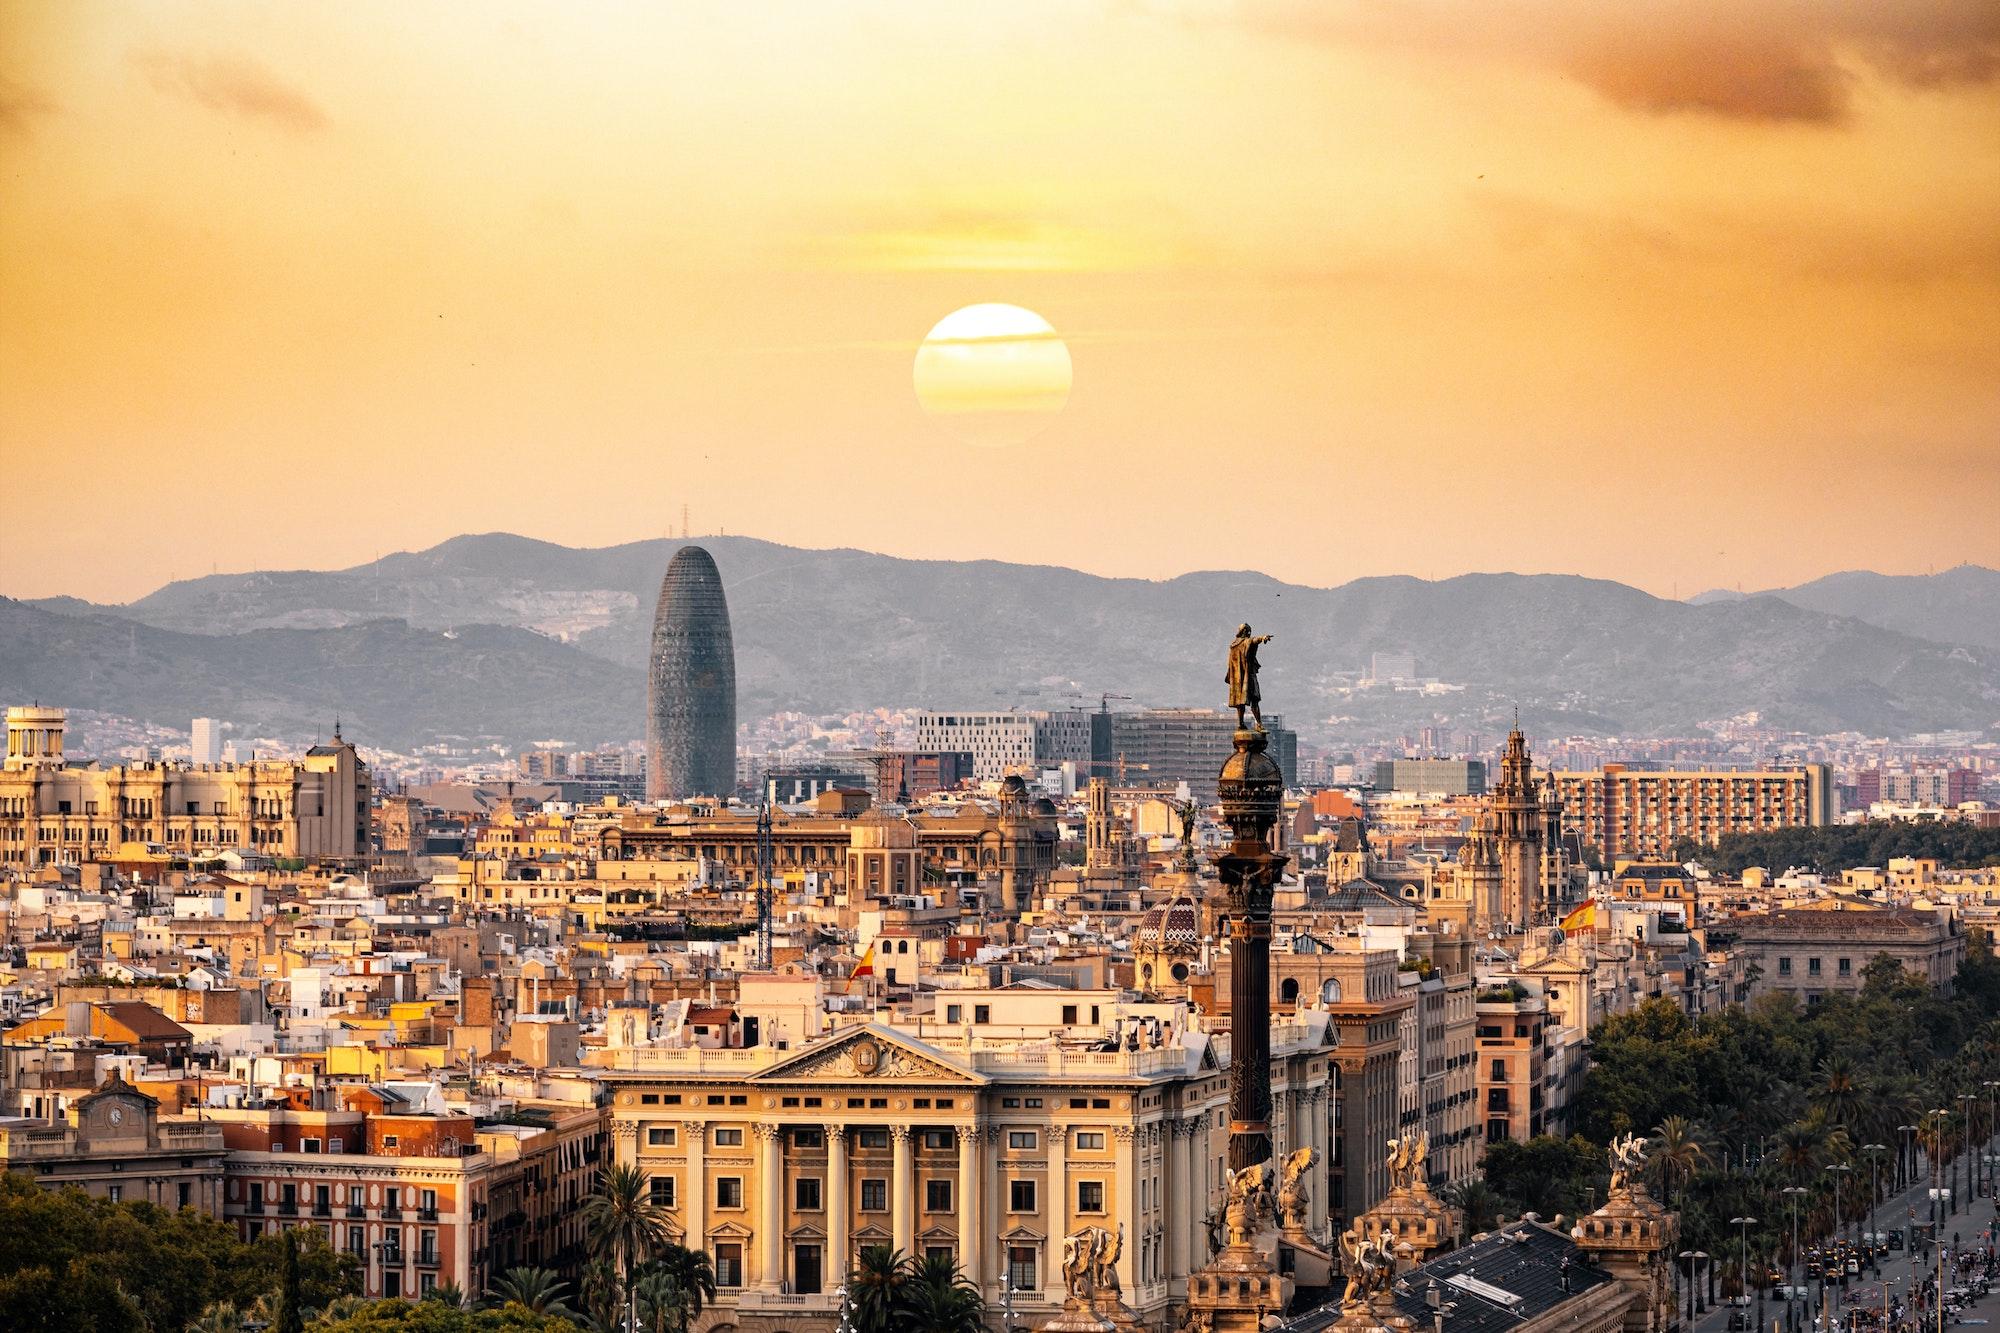 Granada, Spain is the perfect destination to teach English